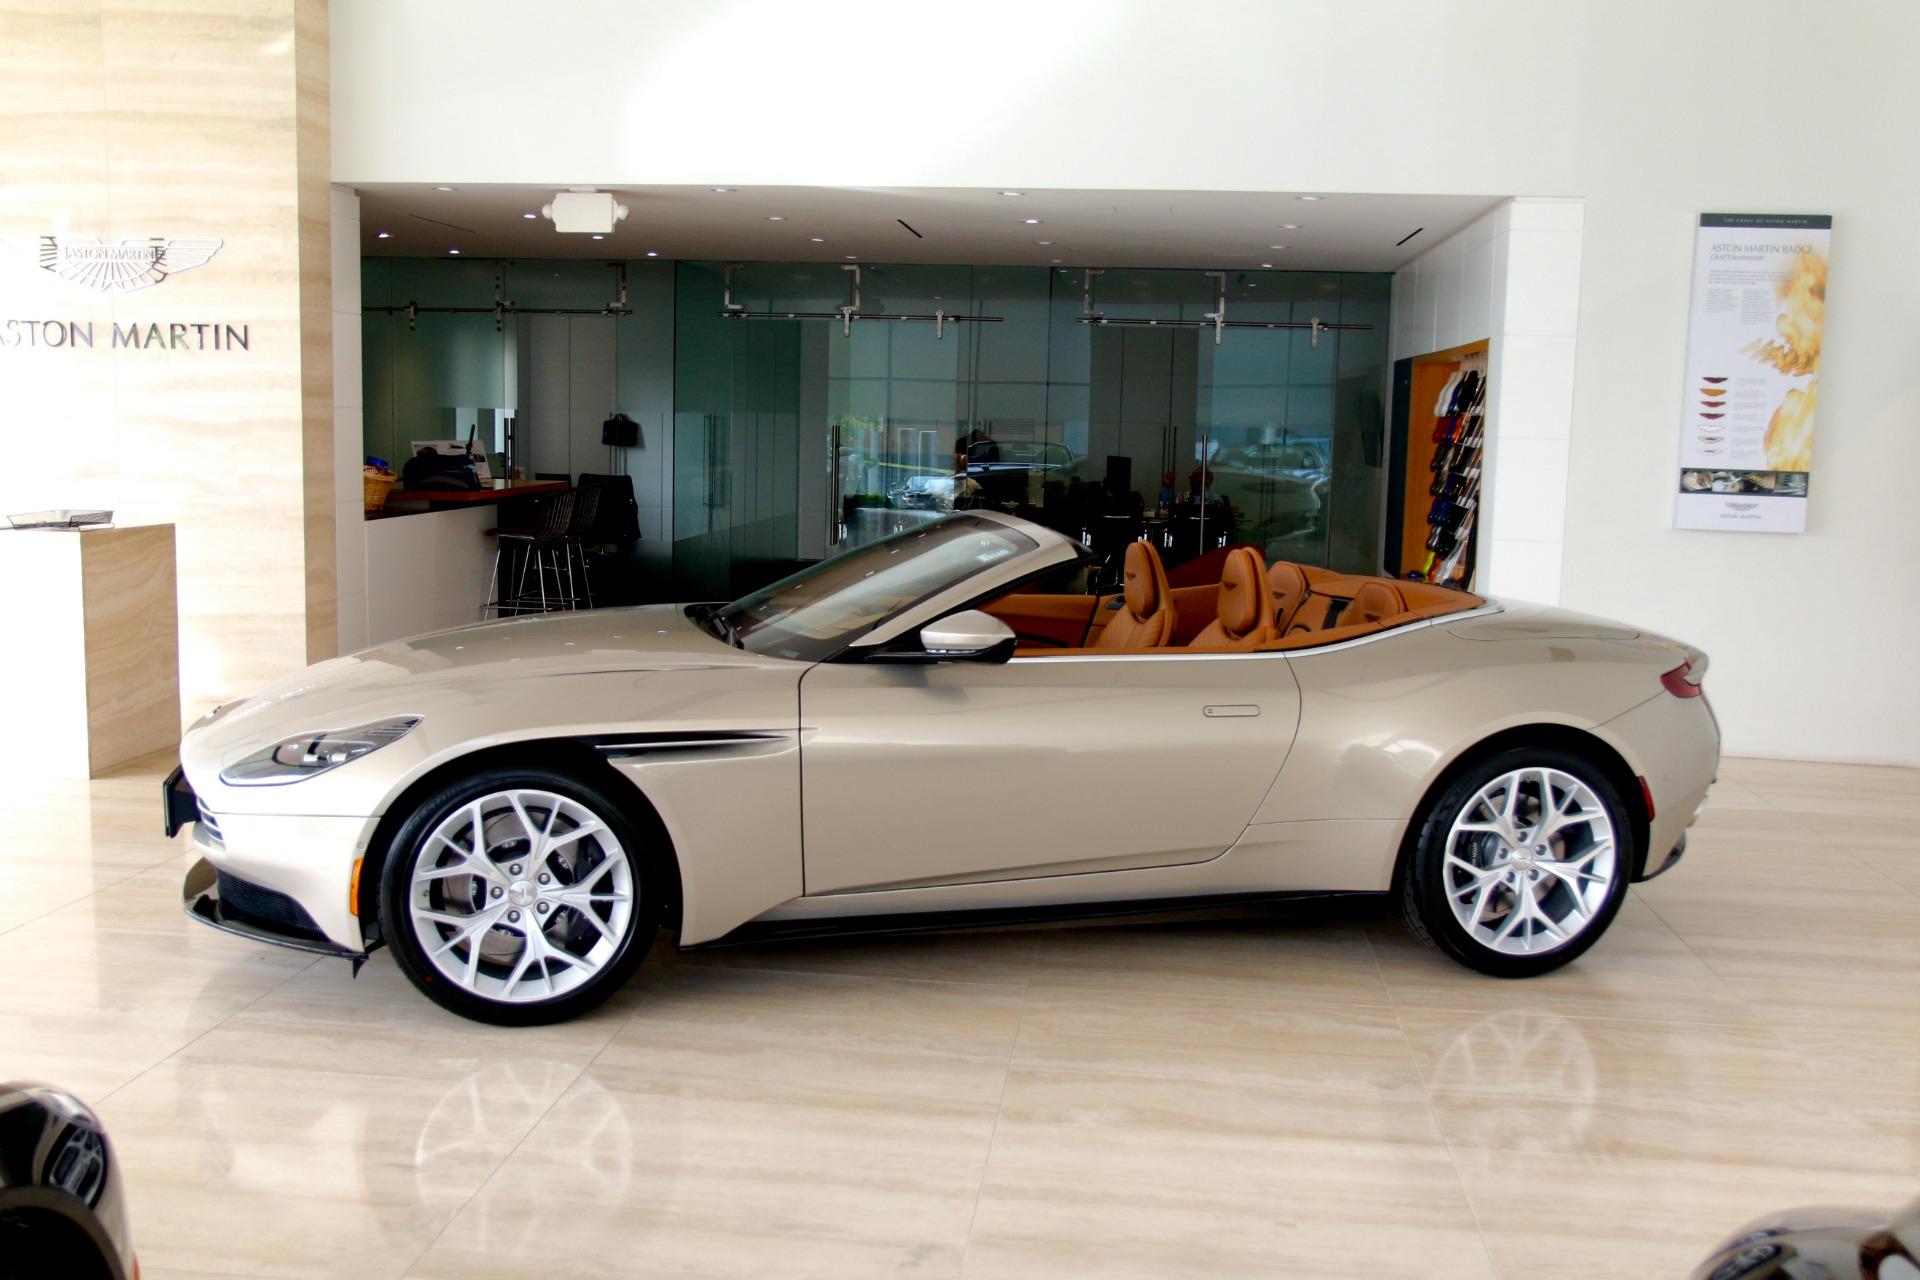 2019 Aston Martin Db11 Volante Stock 9nm05888 For Sale Near Vienna Va Va Aston Martin Dealer